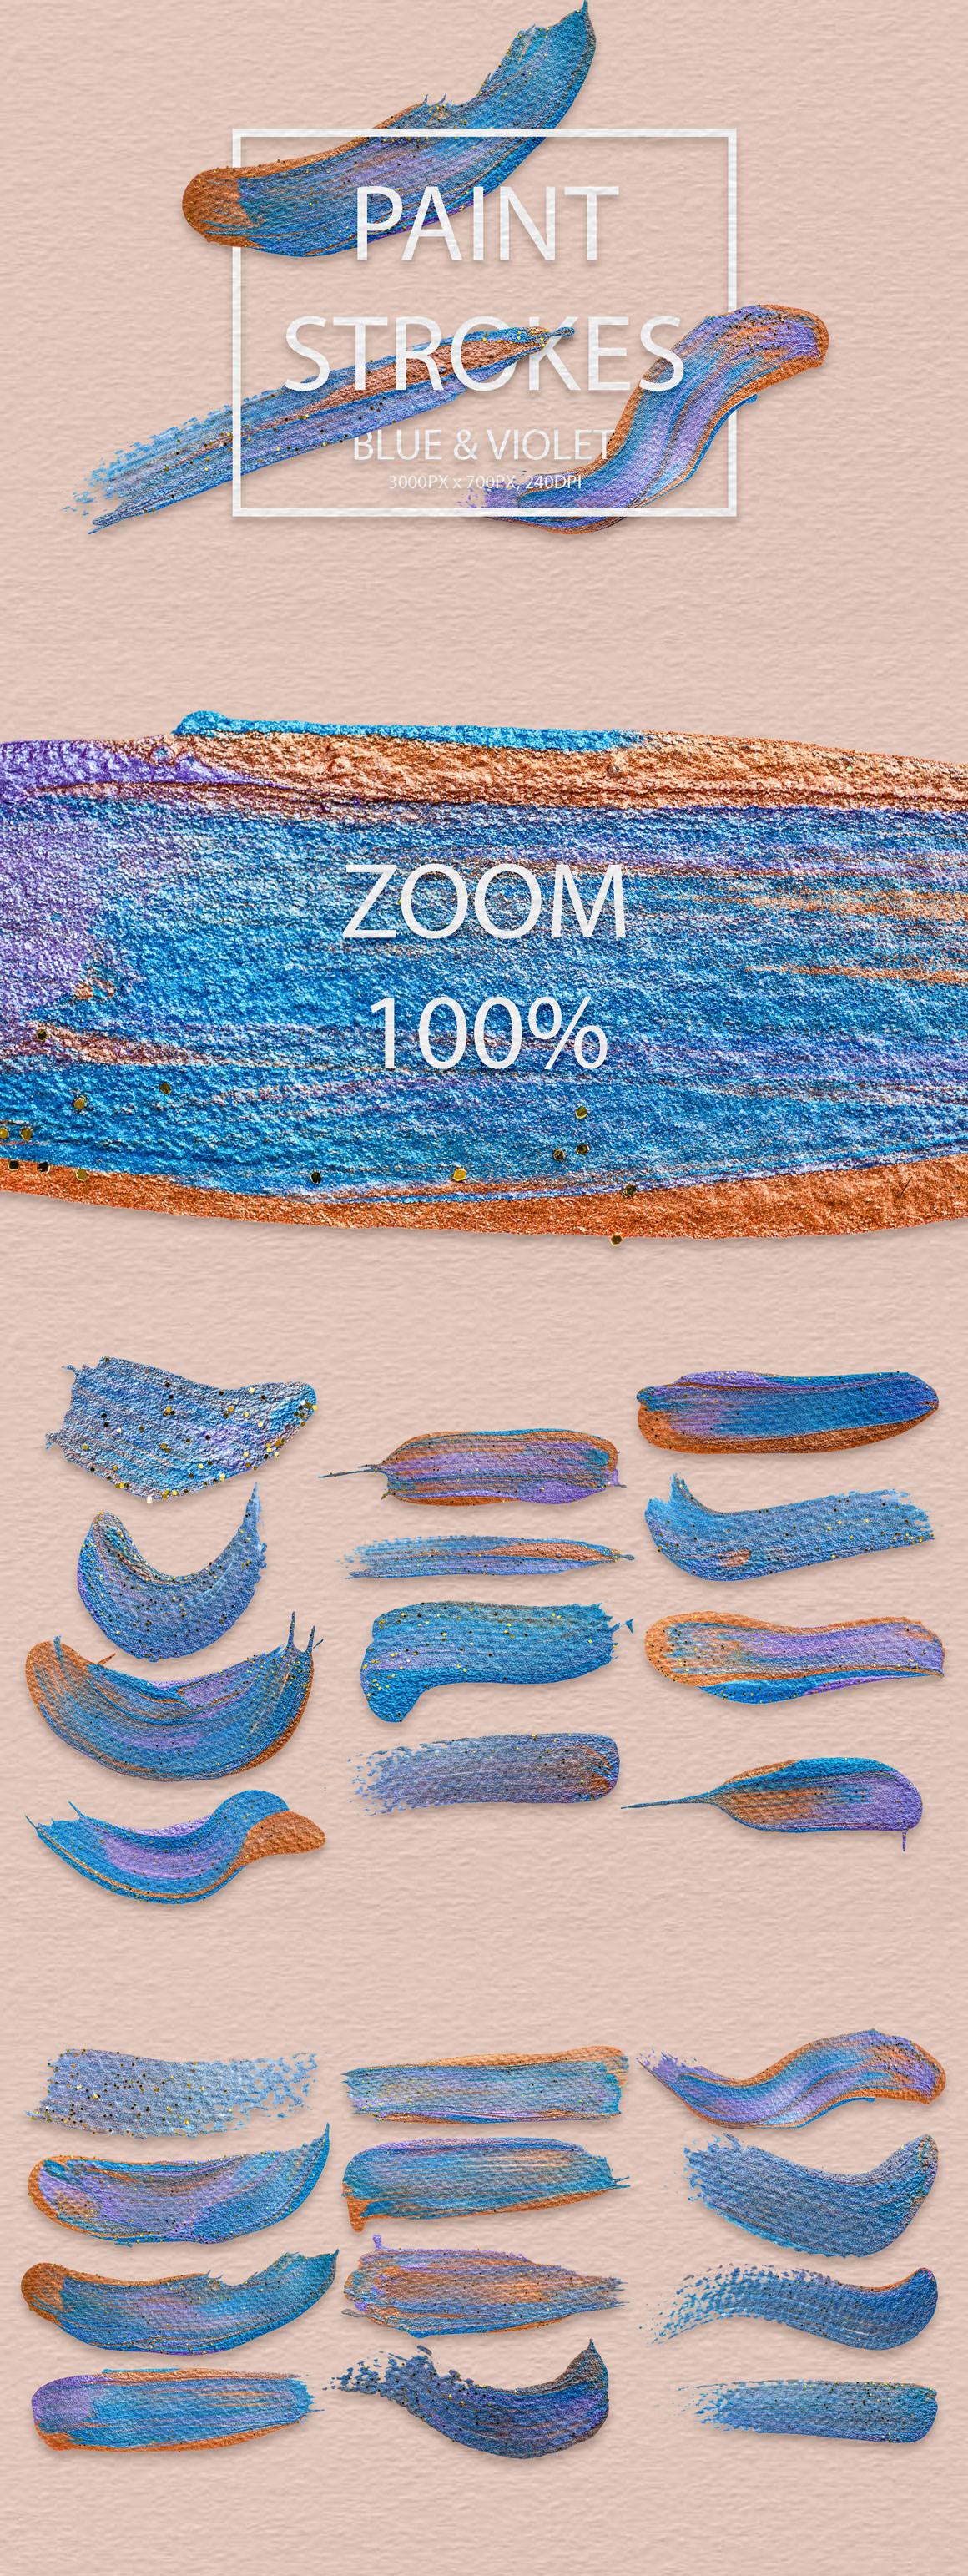 829 Acrylic Brush Strokes and Digital Brush Strokes - $9 - PaintStrokesBlueViolet 01 min